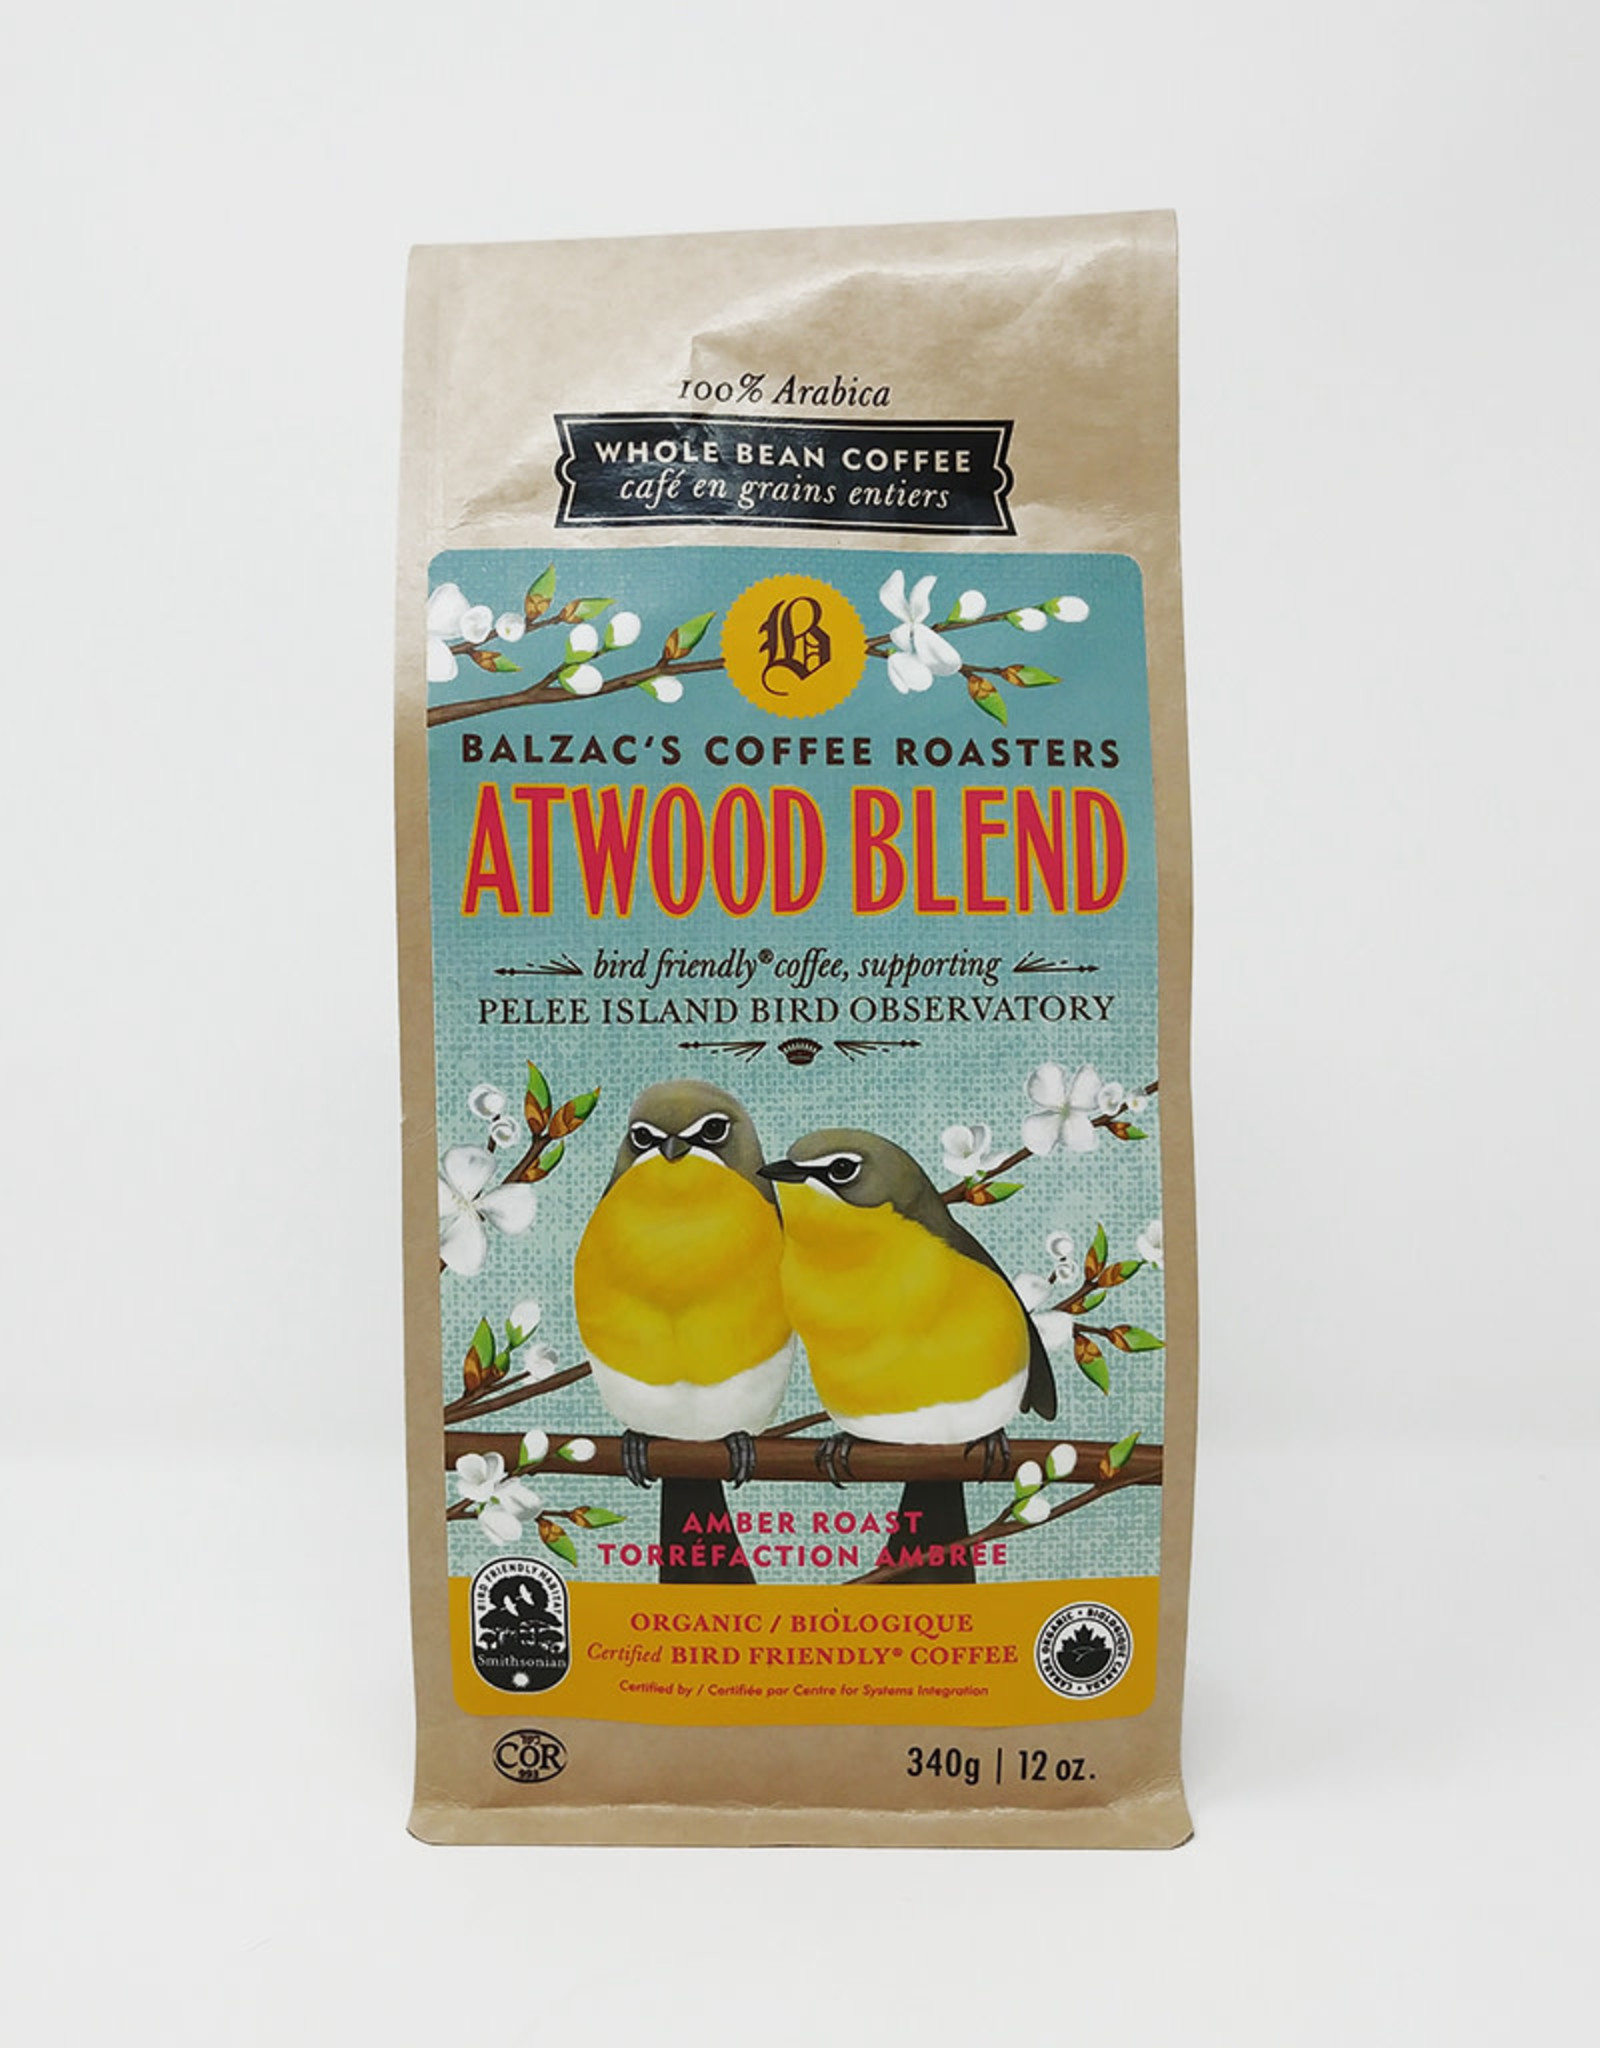 Balzac's Coffee Roasters Balzacs Coffee Roasters -  Atwood Blend (340g)